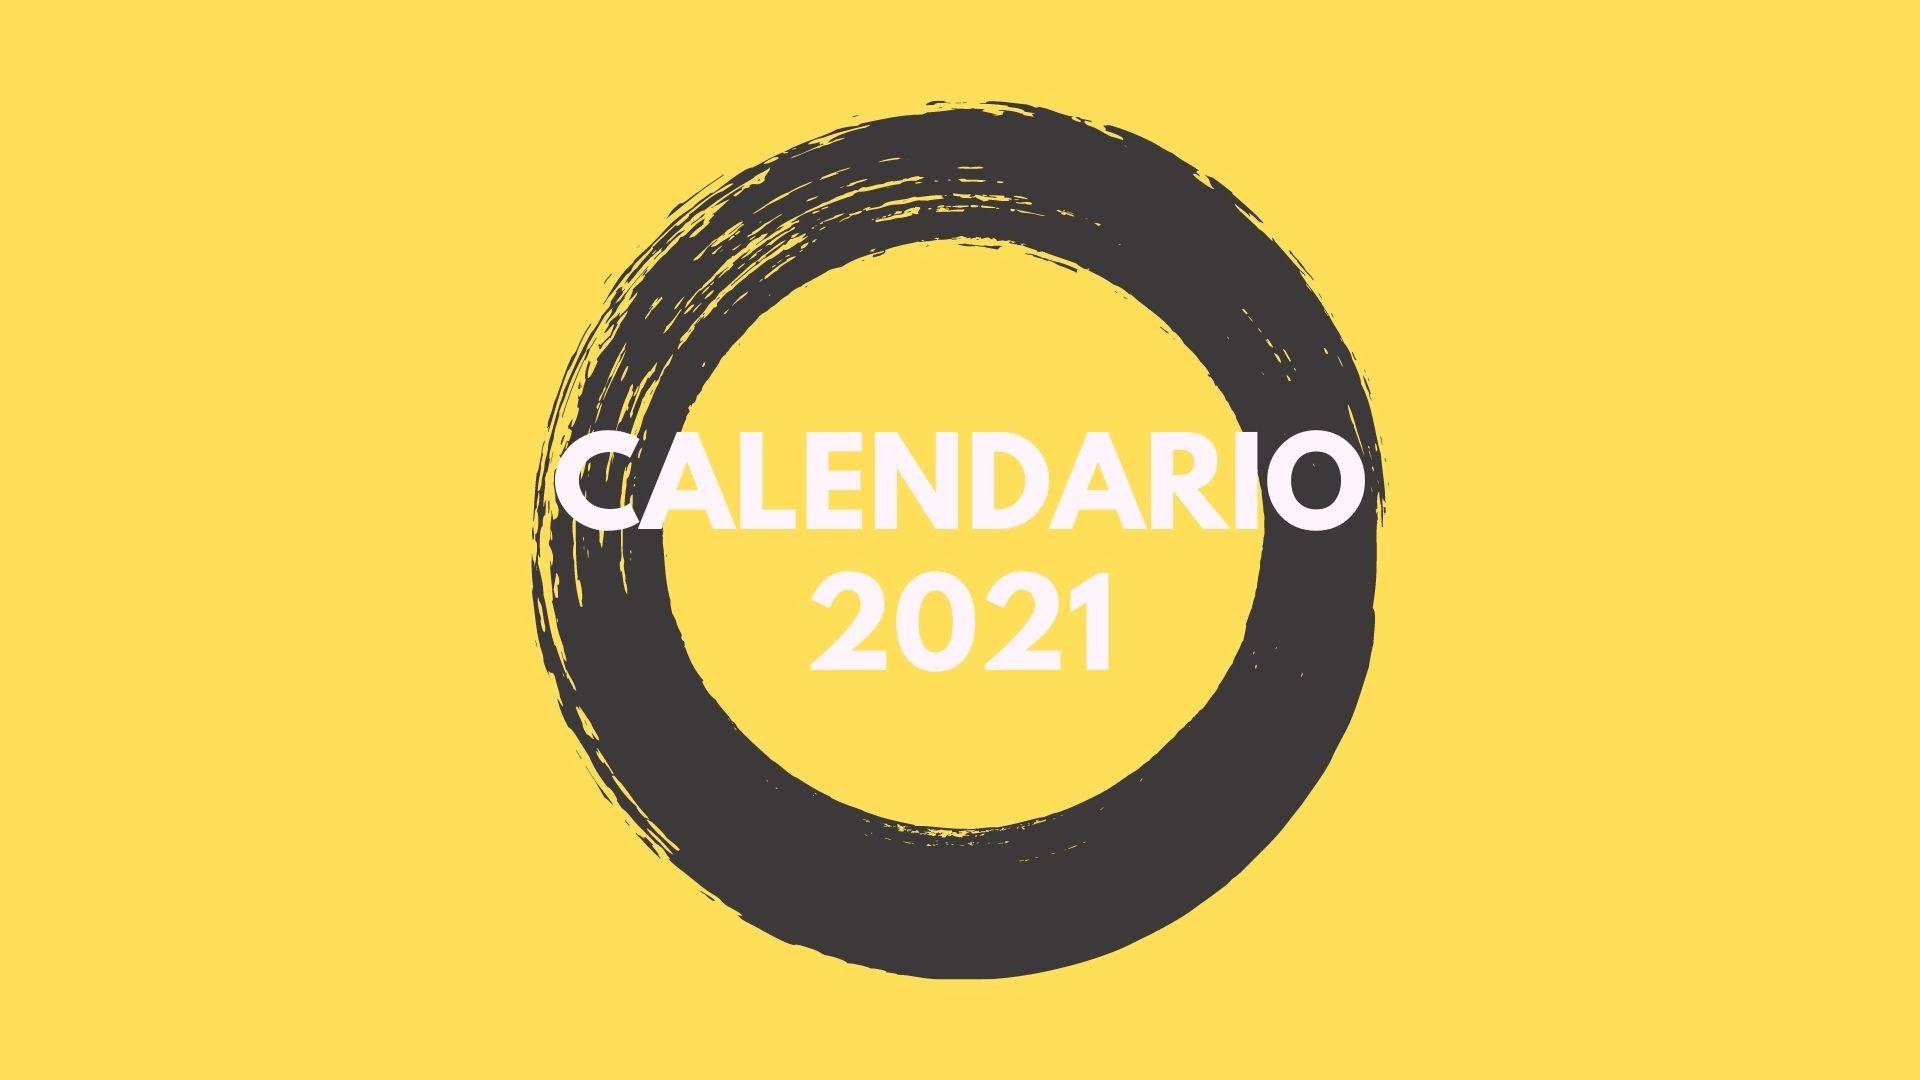 Regolamento: Calendario 2021